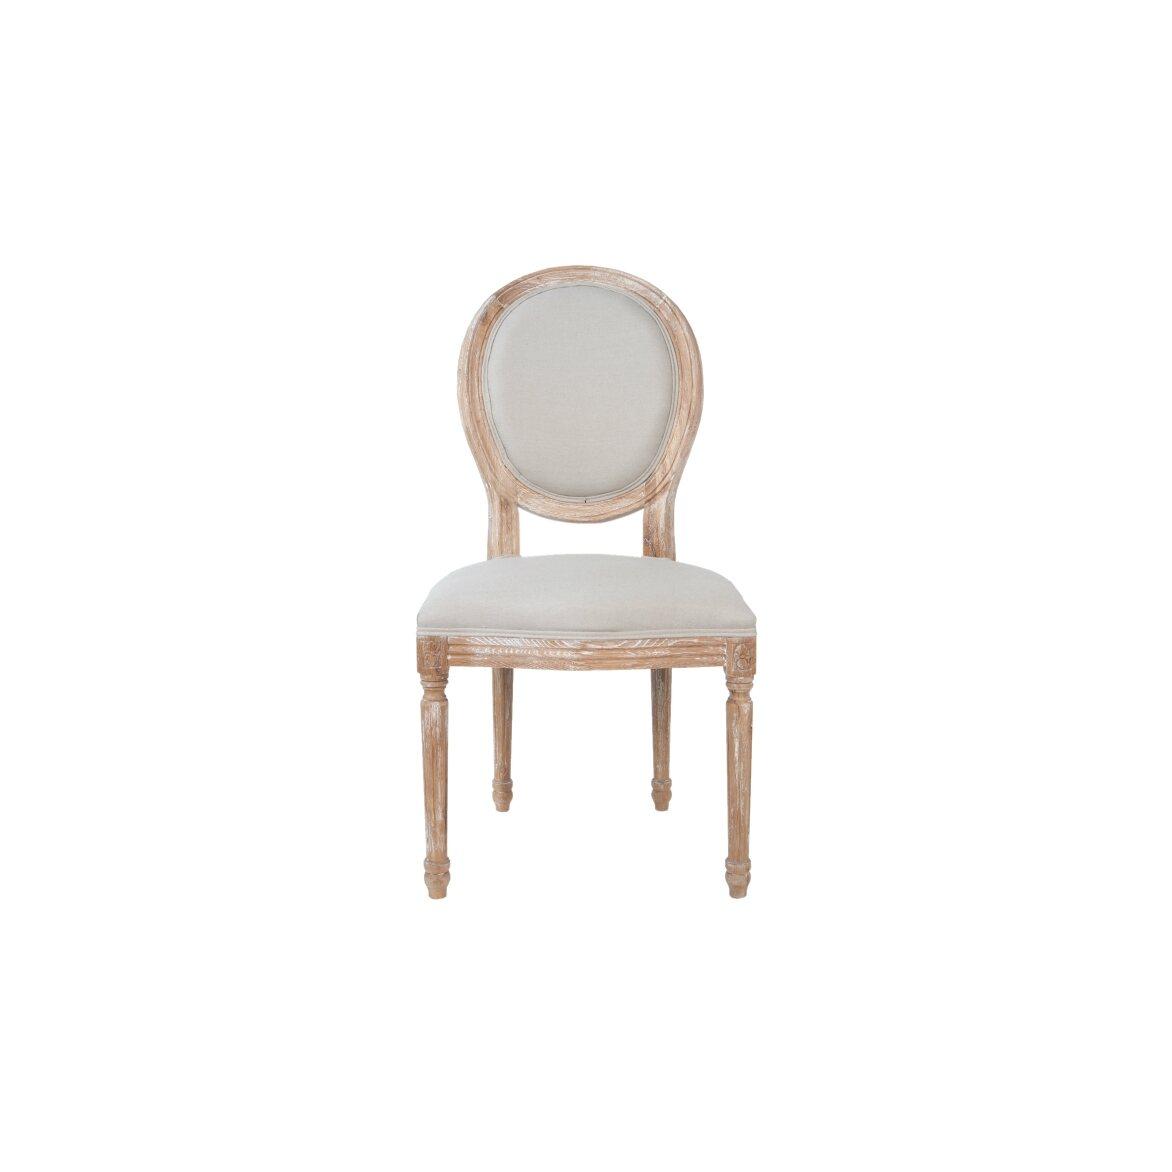 Стул Miro beige | Обеденные стулья Kingsby